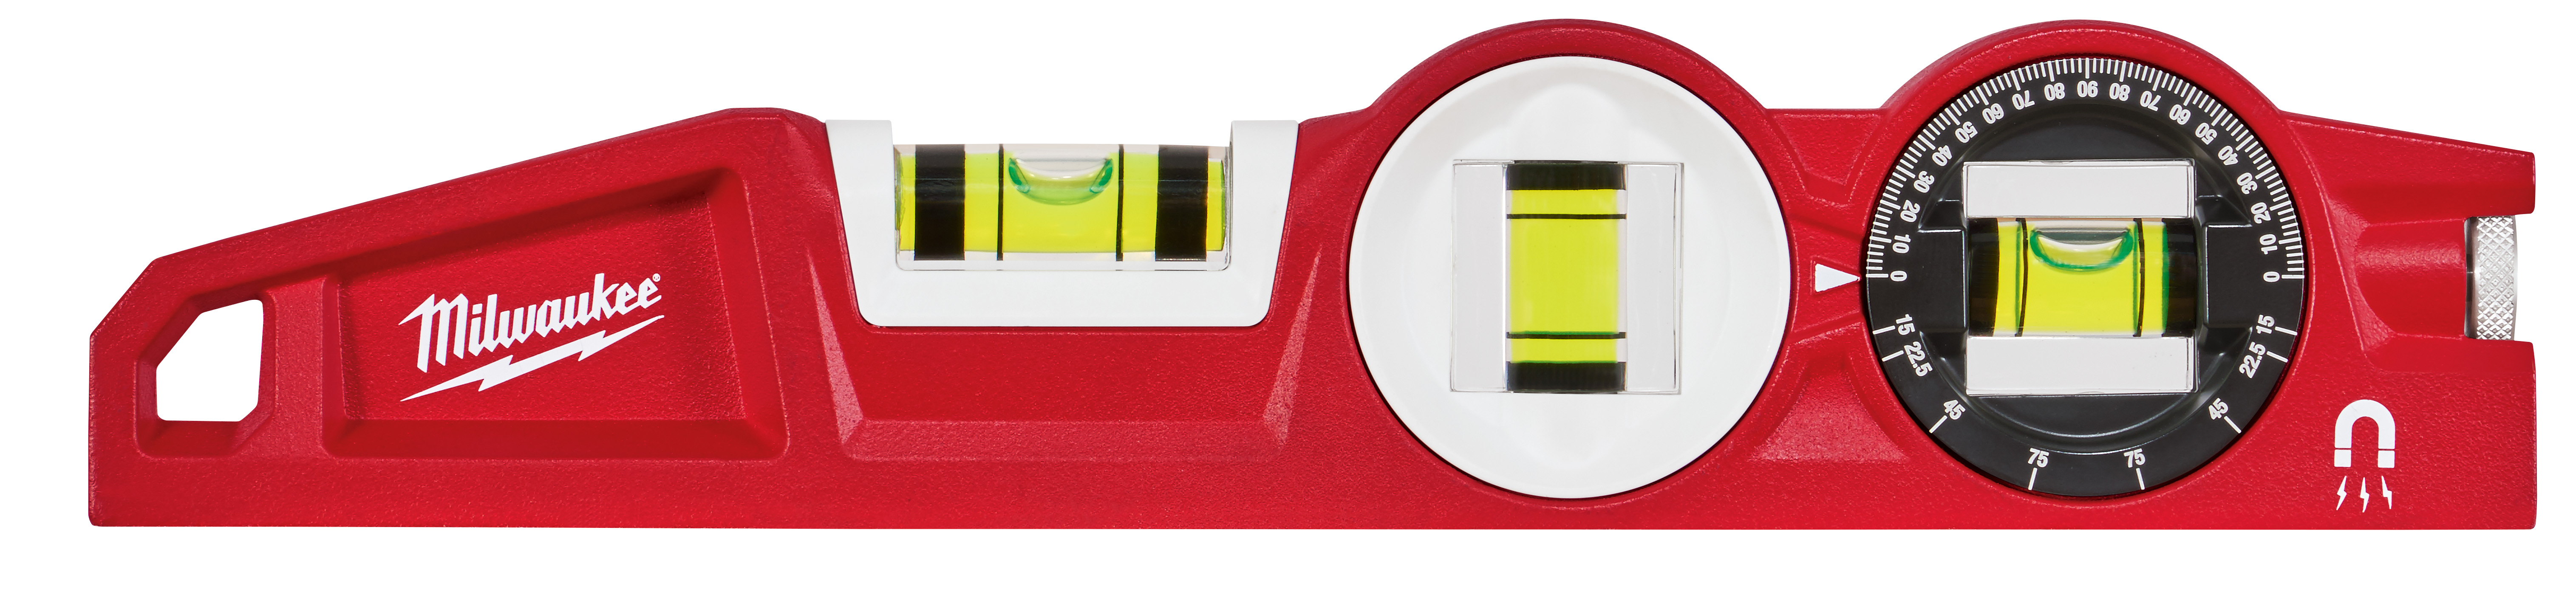 Milwaukee® 48-22-5210 Torpedo Level With 360 deg Locking Vial, 10 in L, 3 Vials, Plastic, 0.0005 in/in